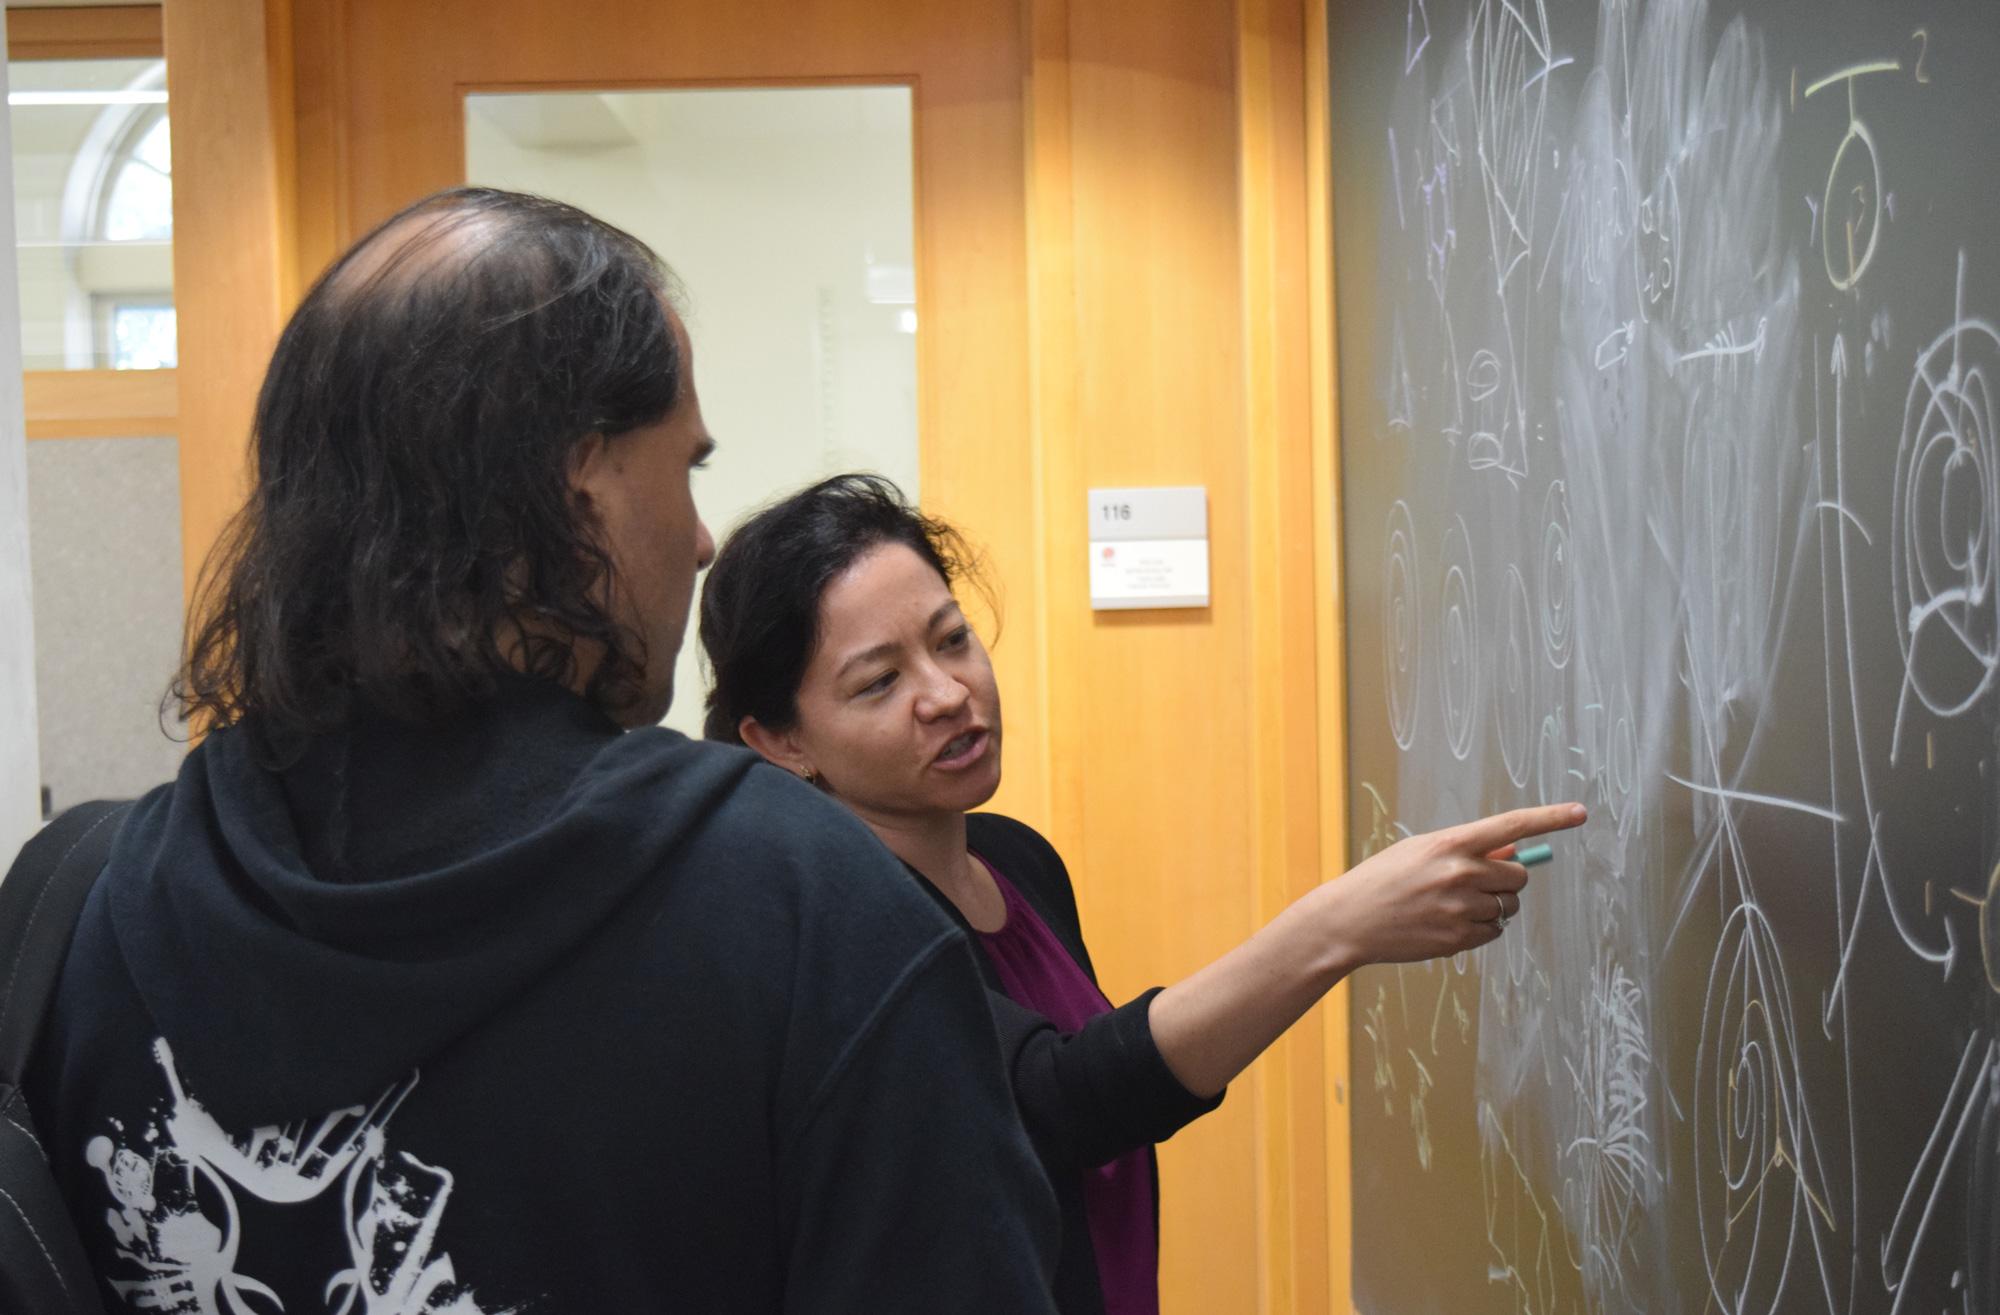 Lauren Williams and Nima Arkani-Hamed talking in front of a blackboard.